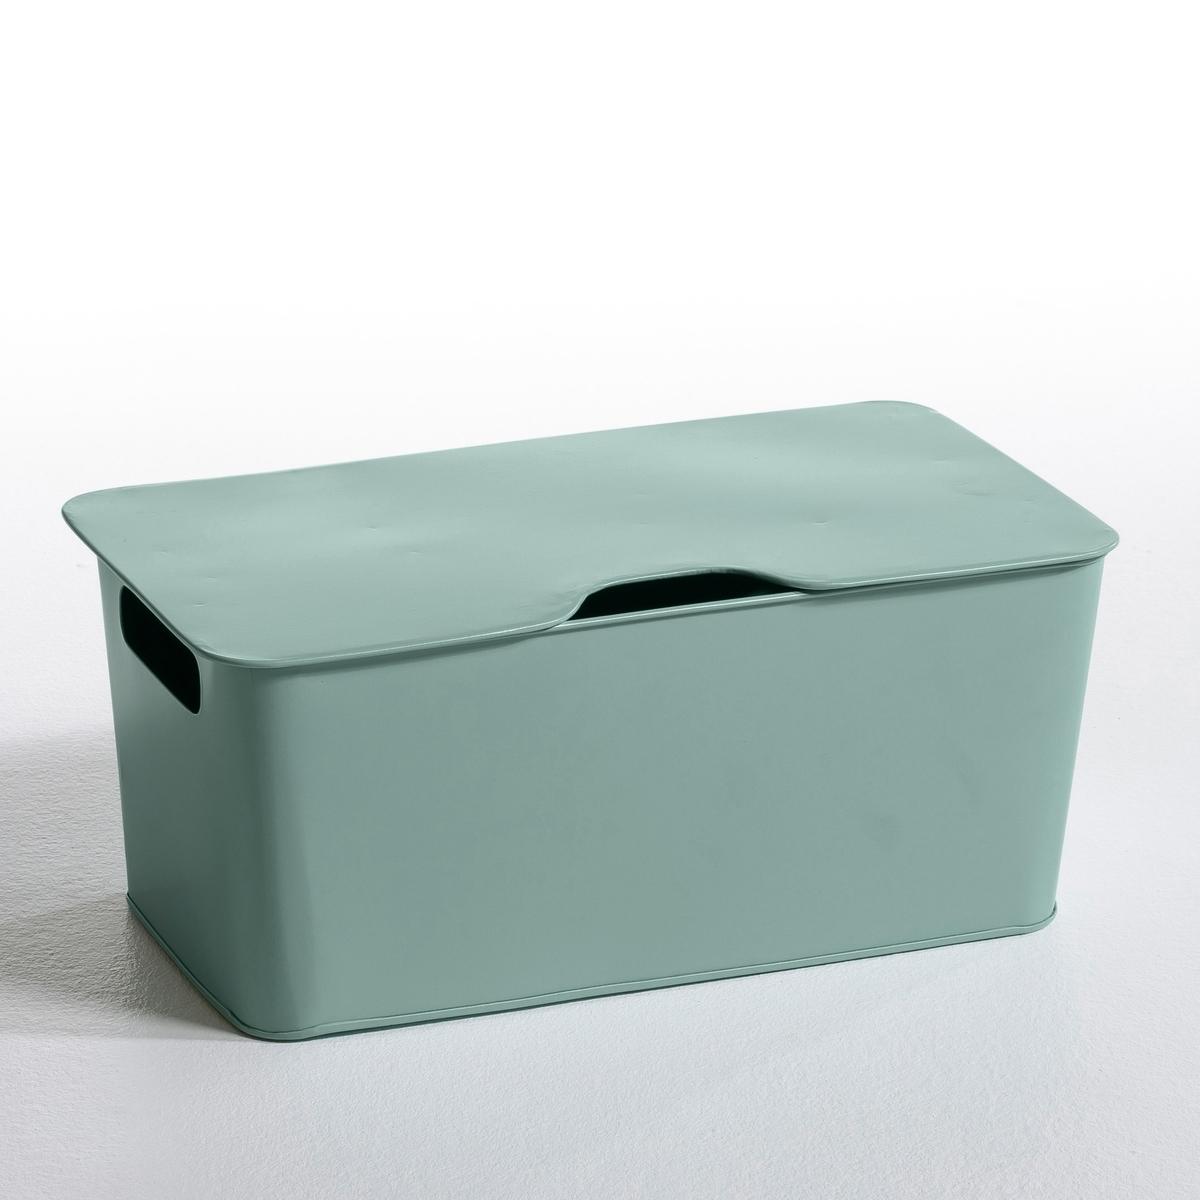 Image of ARREGLO Stackable Metal Storage Box, Large